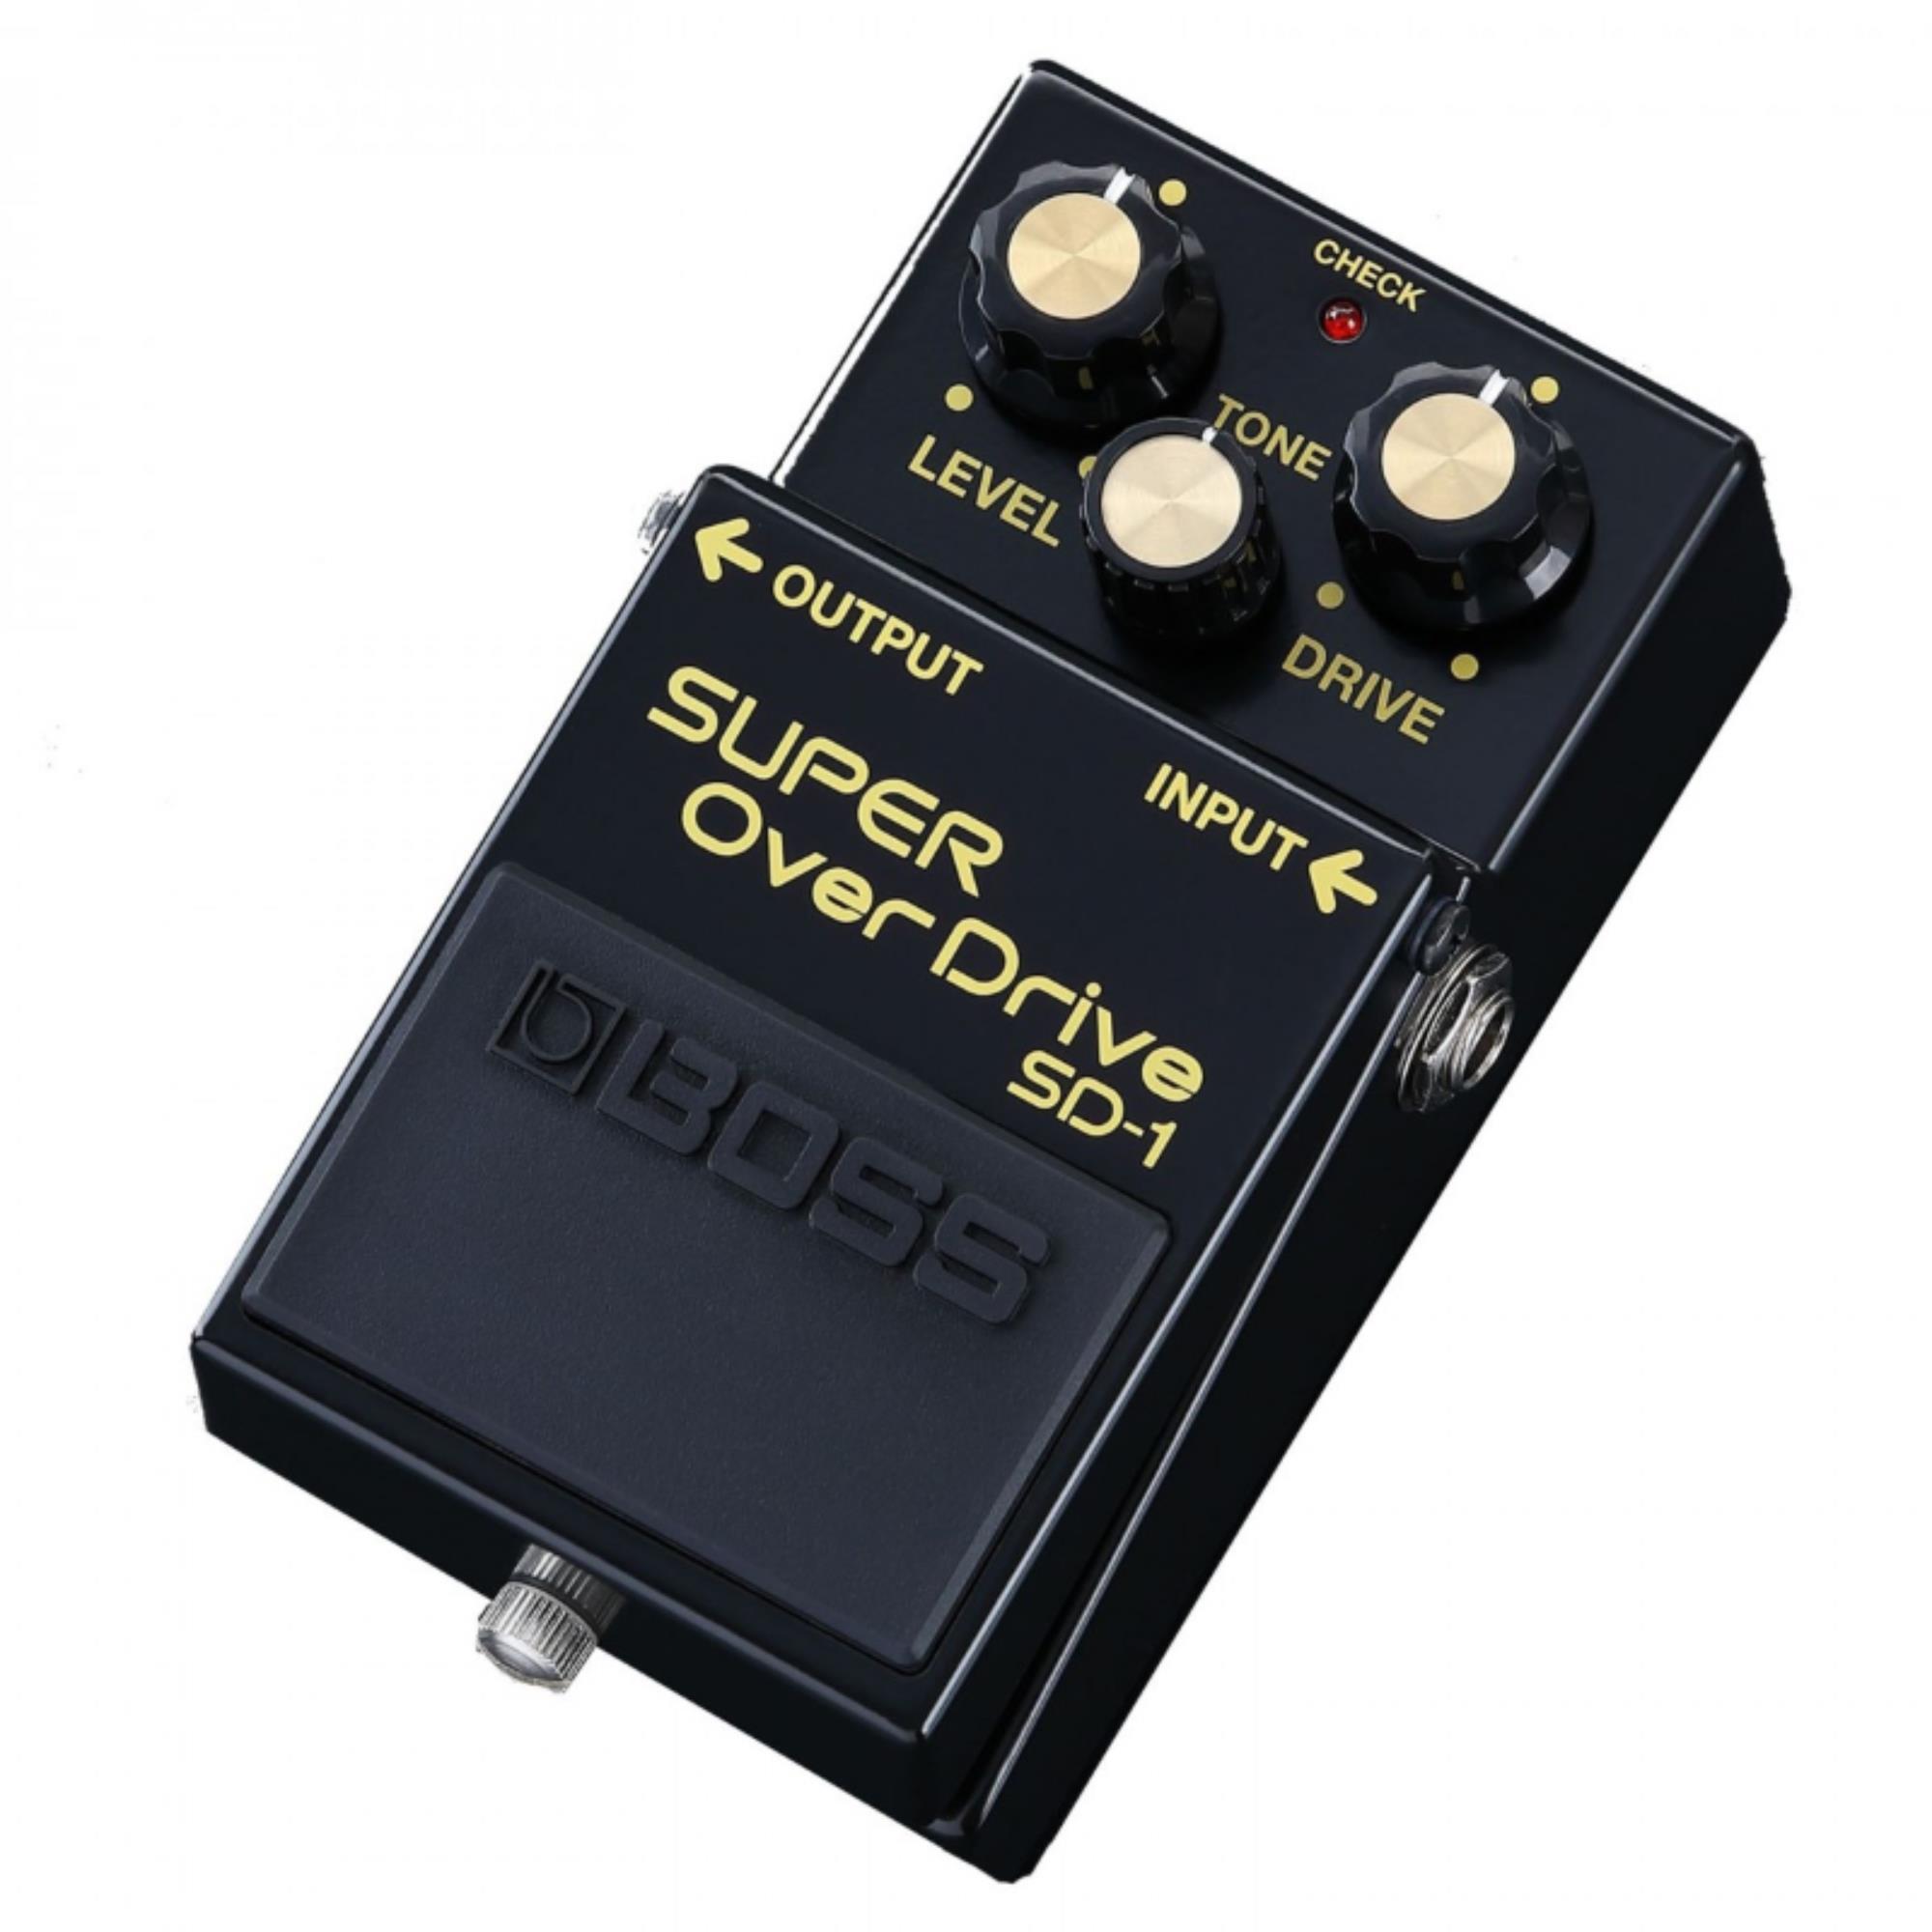 BOSS-SD-1-4A-SUPER-OVERDRIVE-30TH-ANNIVERSARY-sku-24615